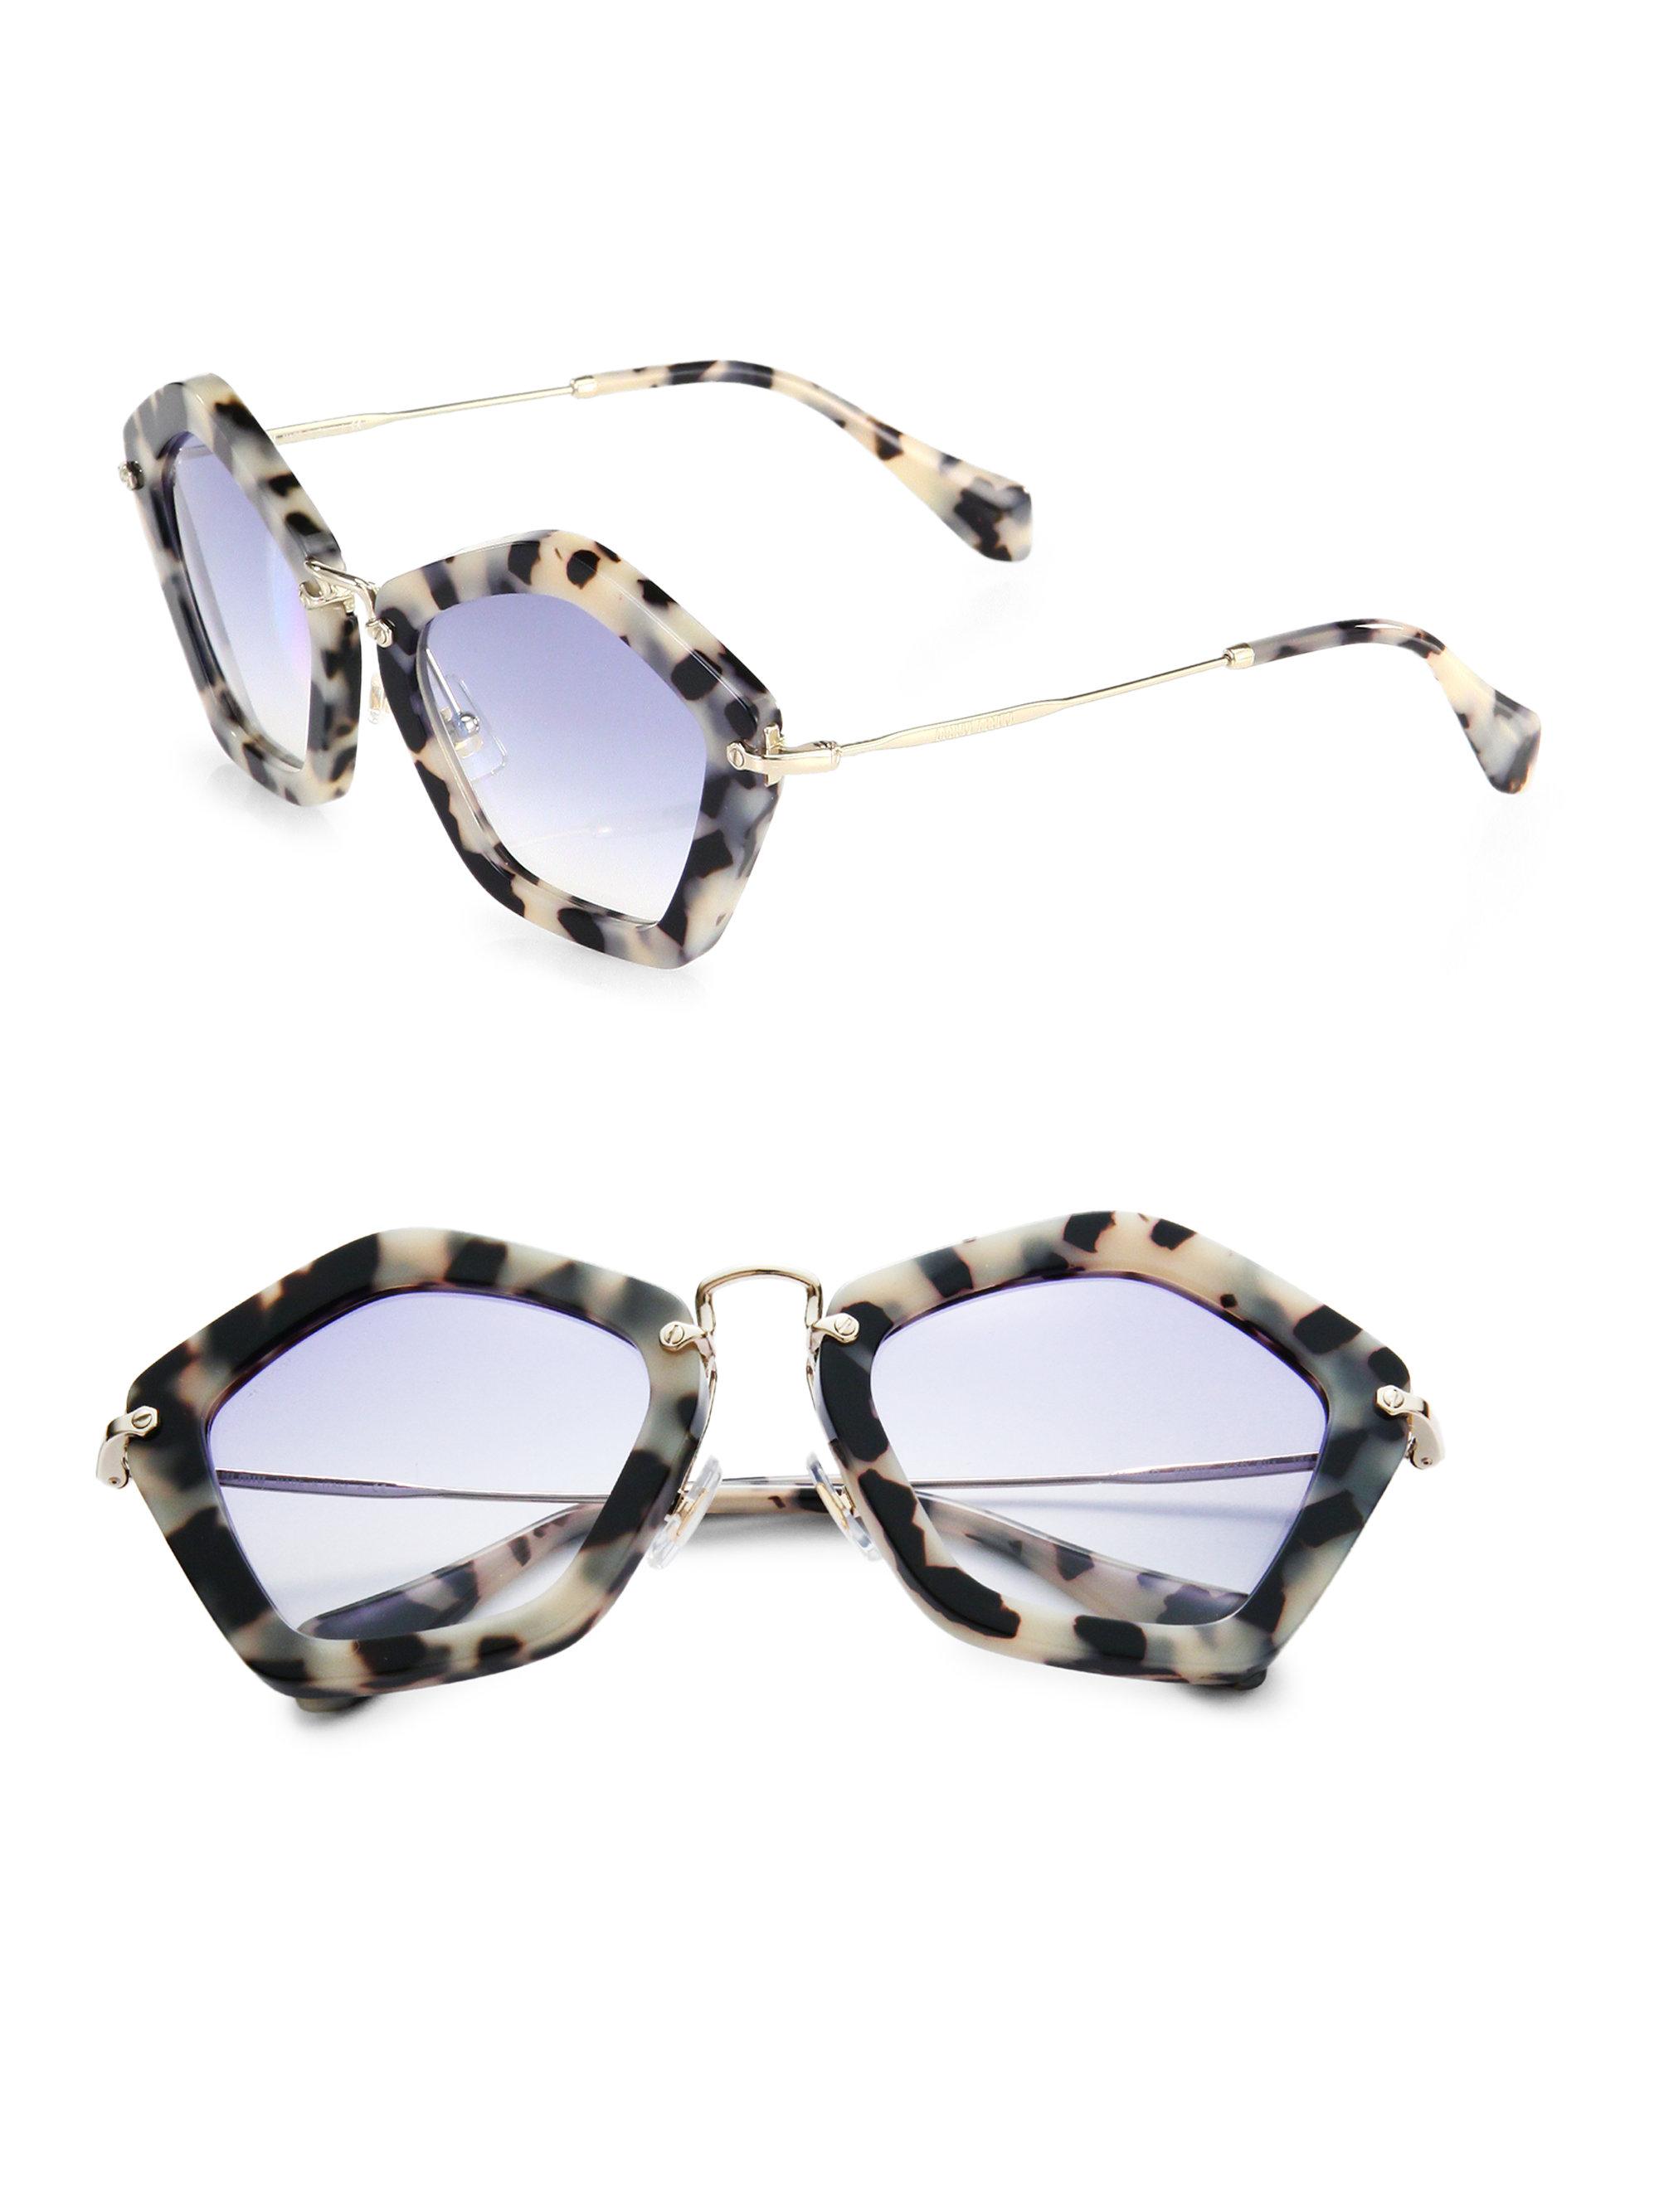 305e7c5bebc Miu Miu Black And White Sunglasses